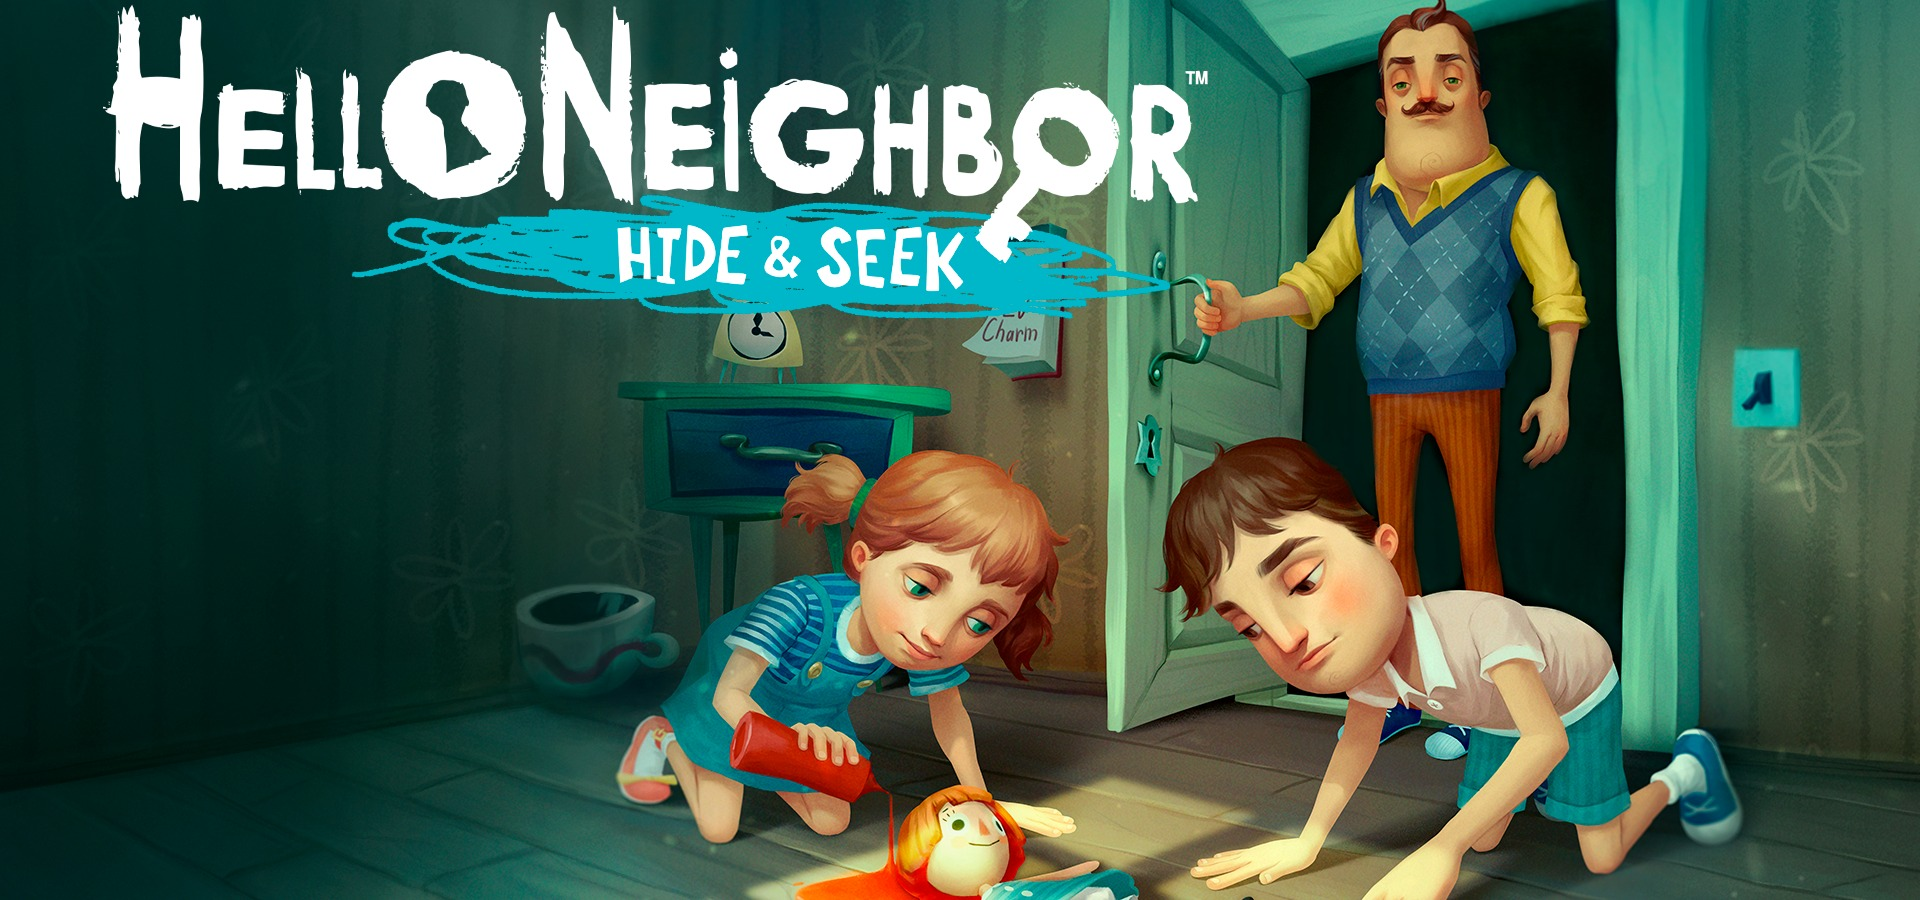 Hello Neighbor: Hide & Seek dostępne od 7 grudnia